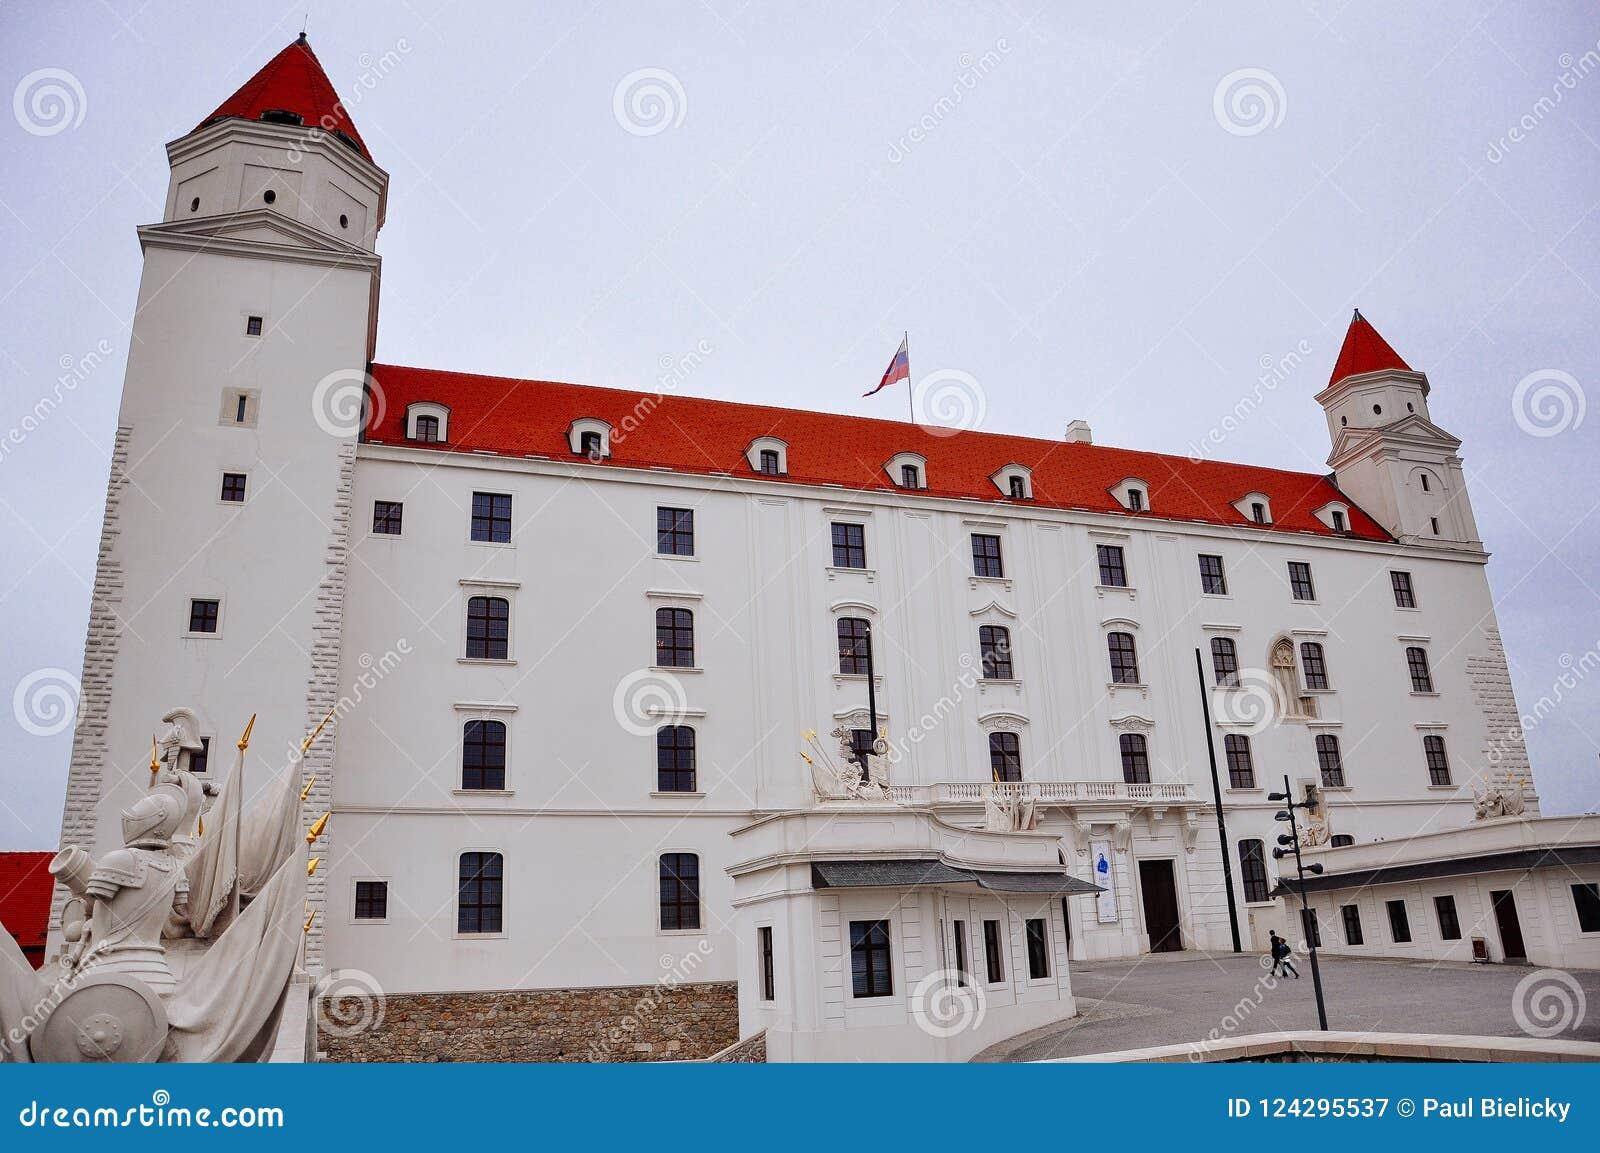 A view of Bratislava Castle, Bratislava, Slovakia.